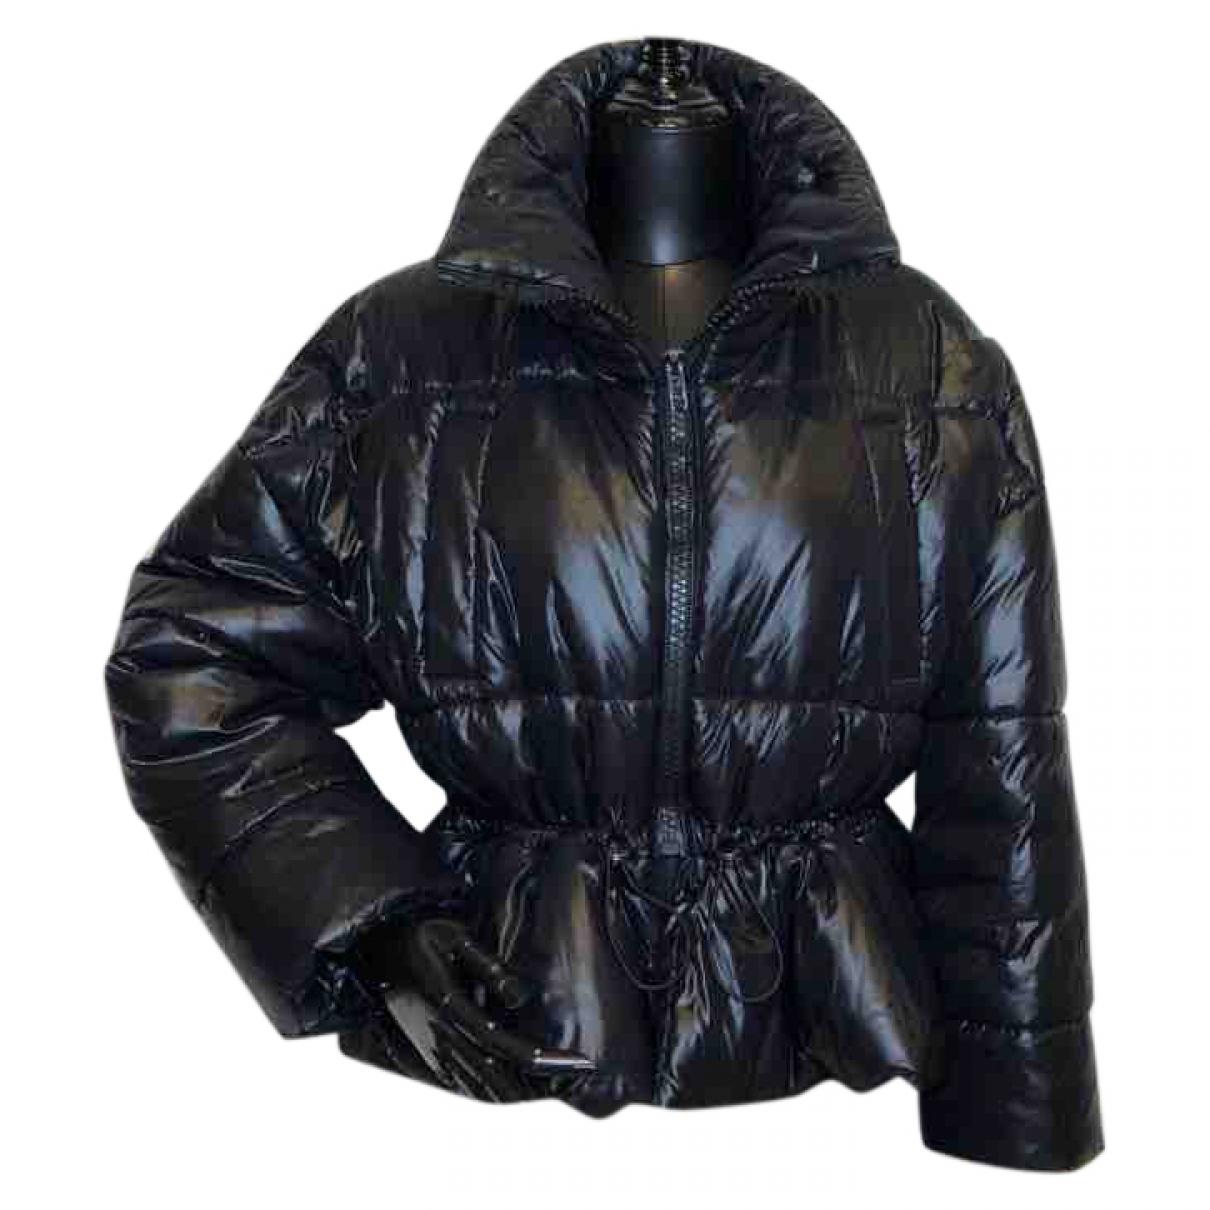 Msgm \N Black coat for Women 38 IT